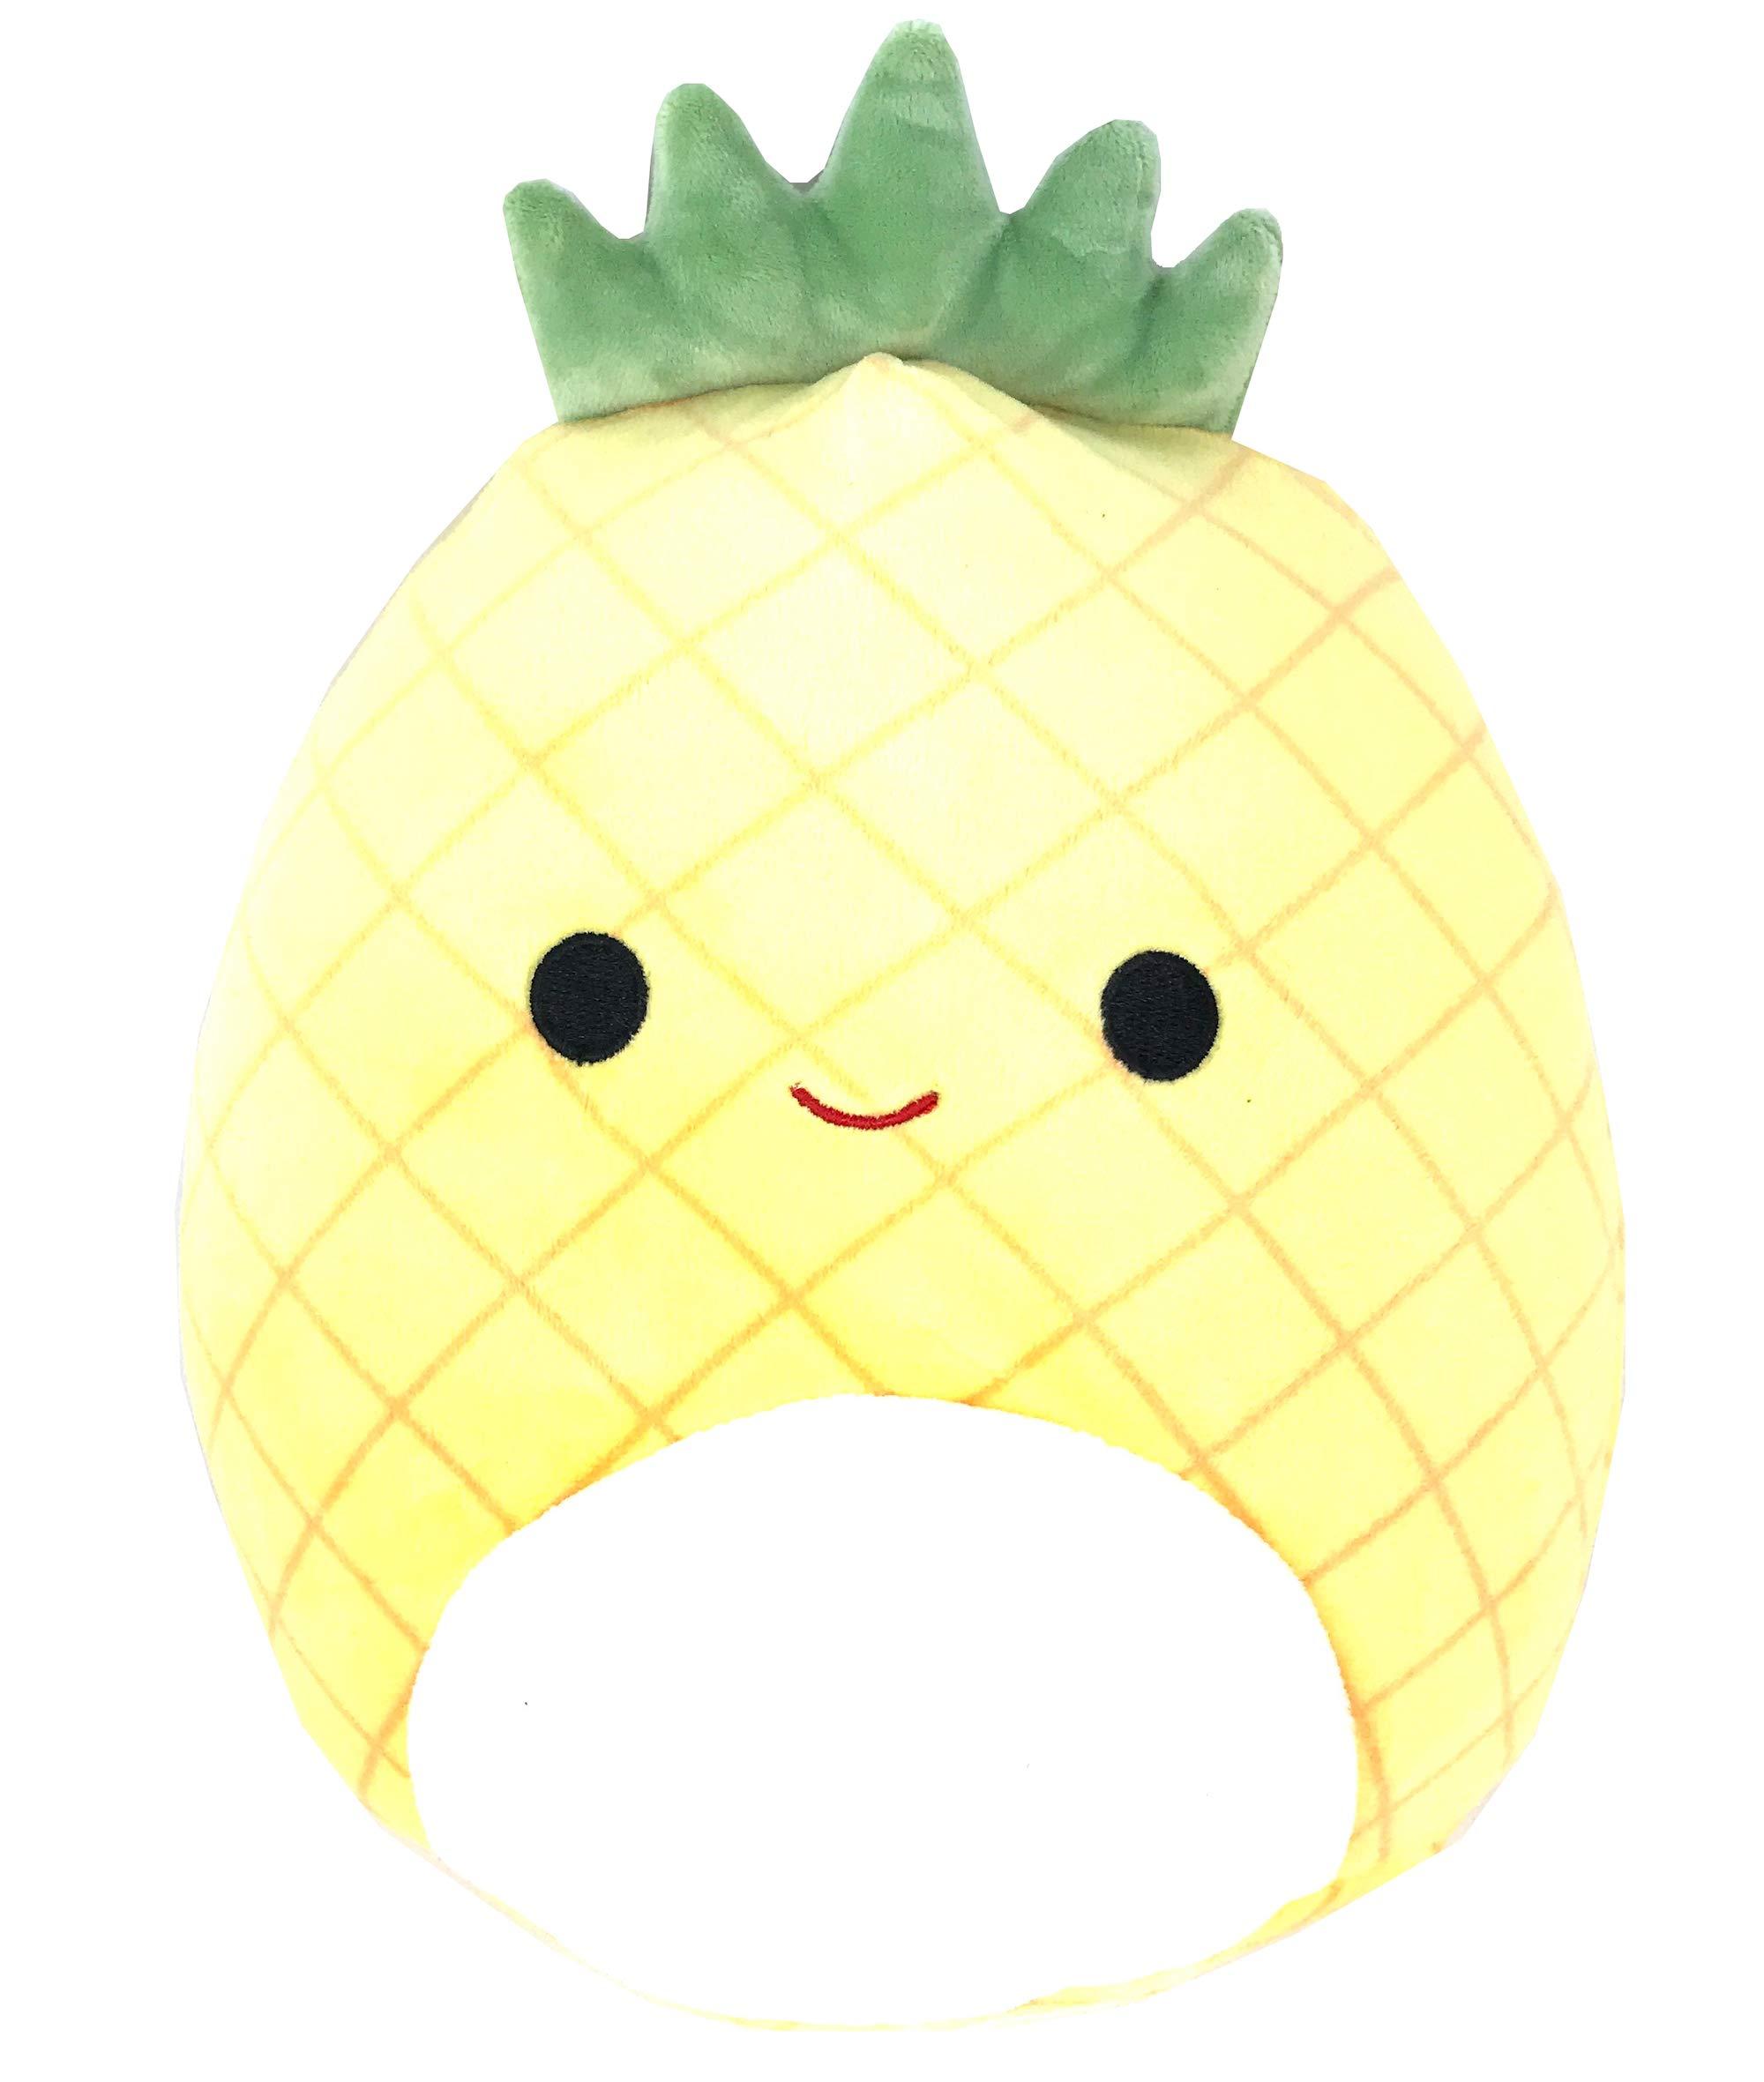 Squishmallow Maui The 12 Pineapple Fruit Super Soft Plush Toy Pillow Pal Buddy Stuffed Animal Birthday Gift